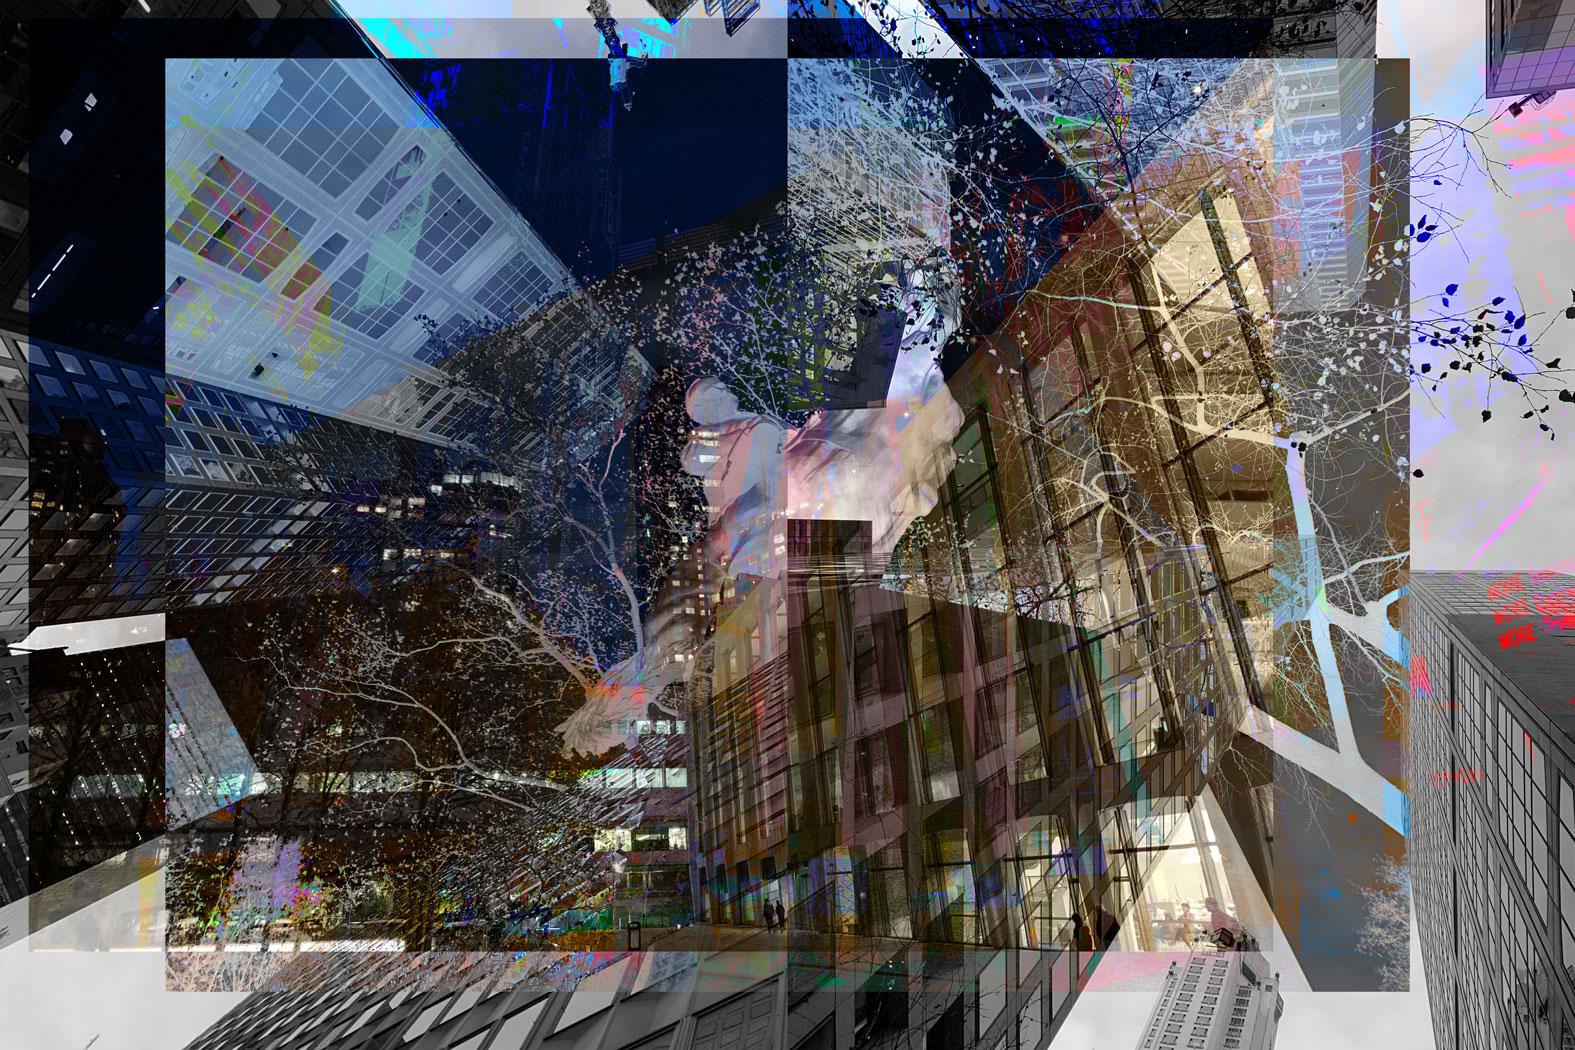 Axiom • 180 x 120 cm (70.86 x 47.24 in)